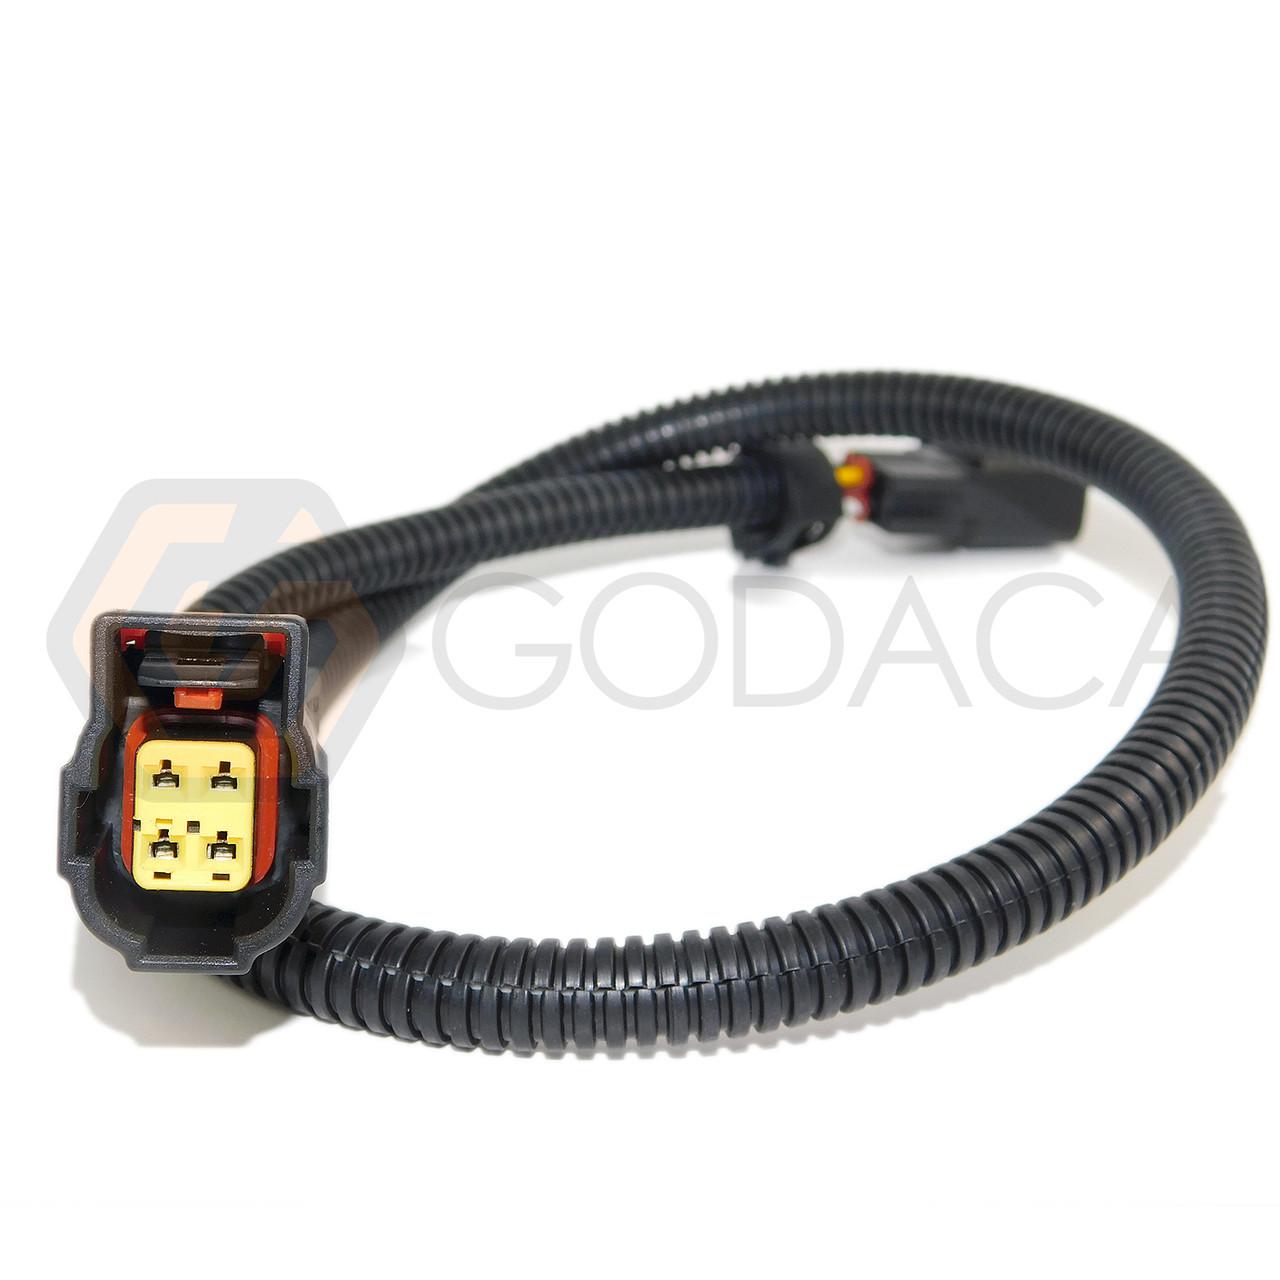 1x wiring harness for oxygen o2 sensor for dodge jeep chrysler 24 godaca llc  [ 1280 x 1280 Pixel ]